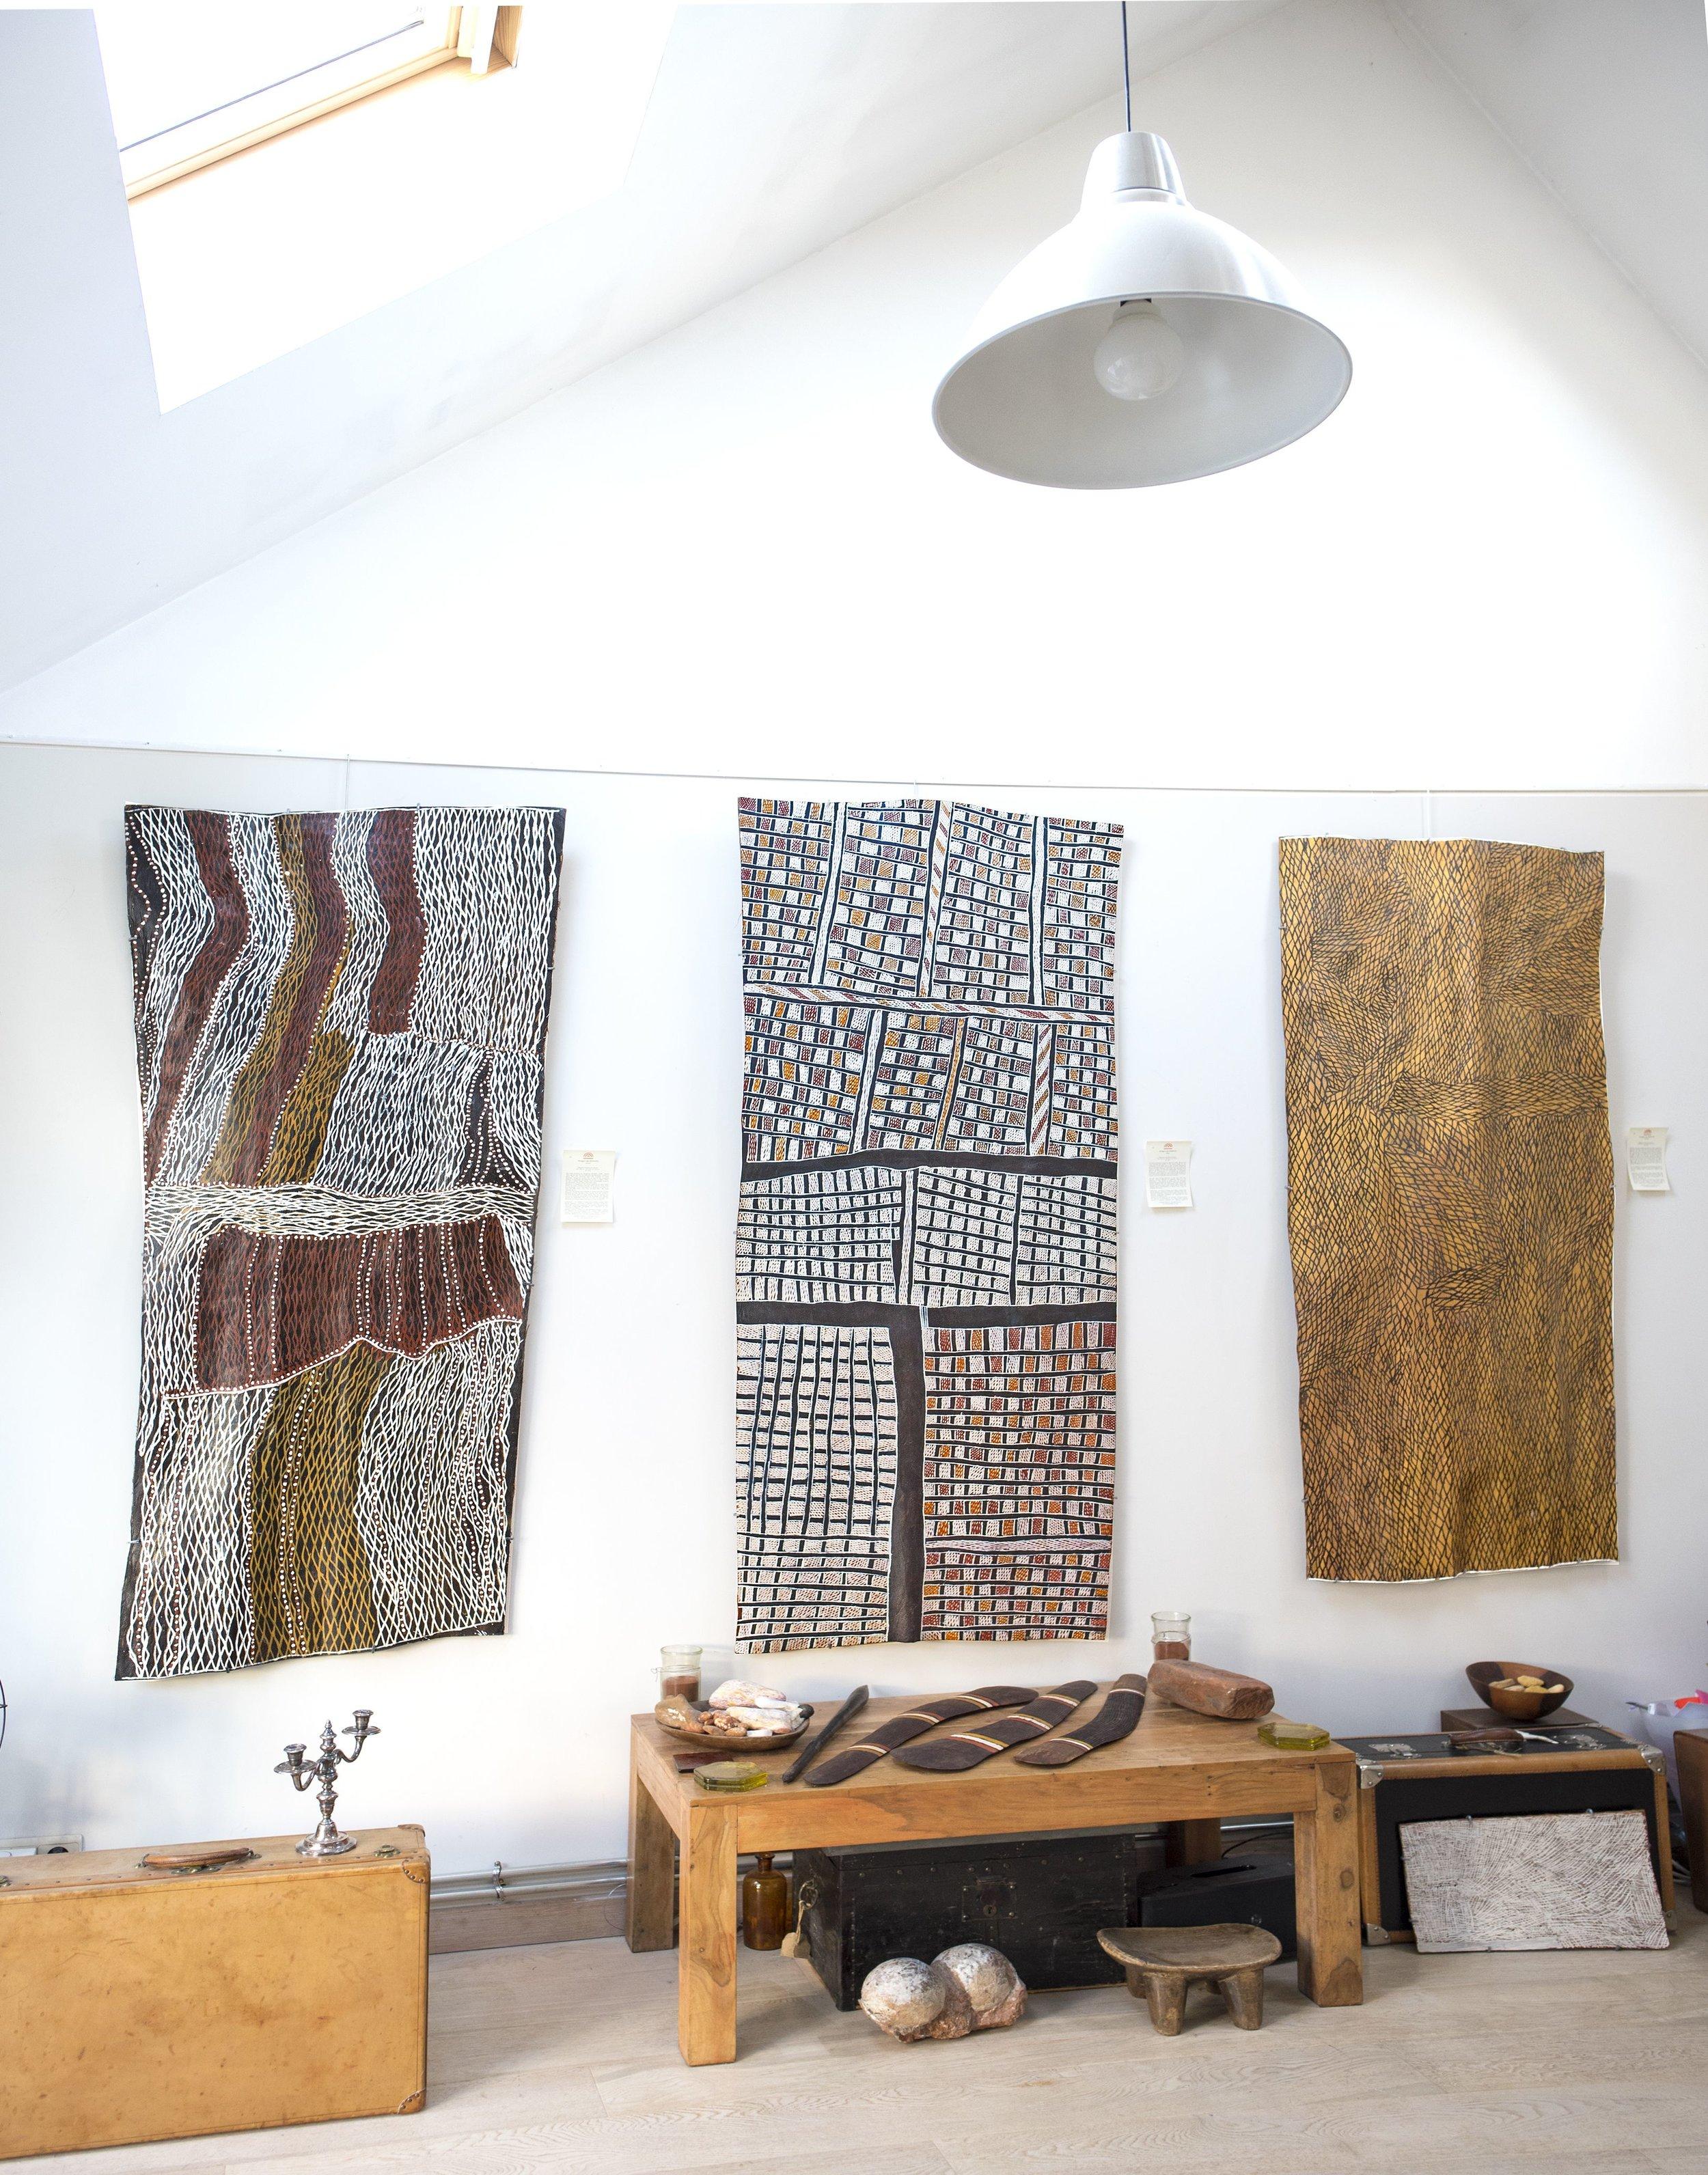 Trois œuvres magistrales de l'artiste Noŋgirrŋa-Marawili (1938). Titres de gauche à droite : Gurtha (189 x 86 cm), Djapu (203 x 91 cm), Yathikpa (190 x 78 cm). Media : natural ochres on bark. © Photo : Aboriginal Signature Estrangin gallery with the courtesy of the artist and Yirrkala community.